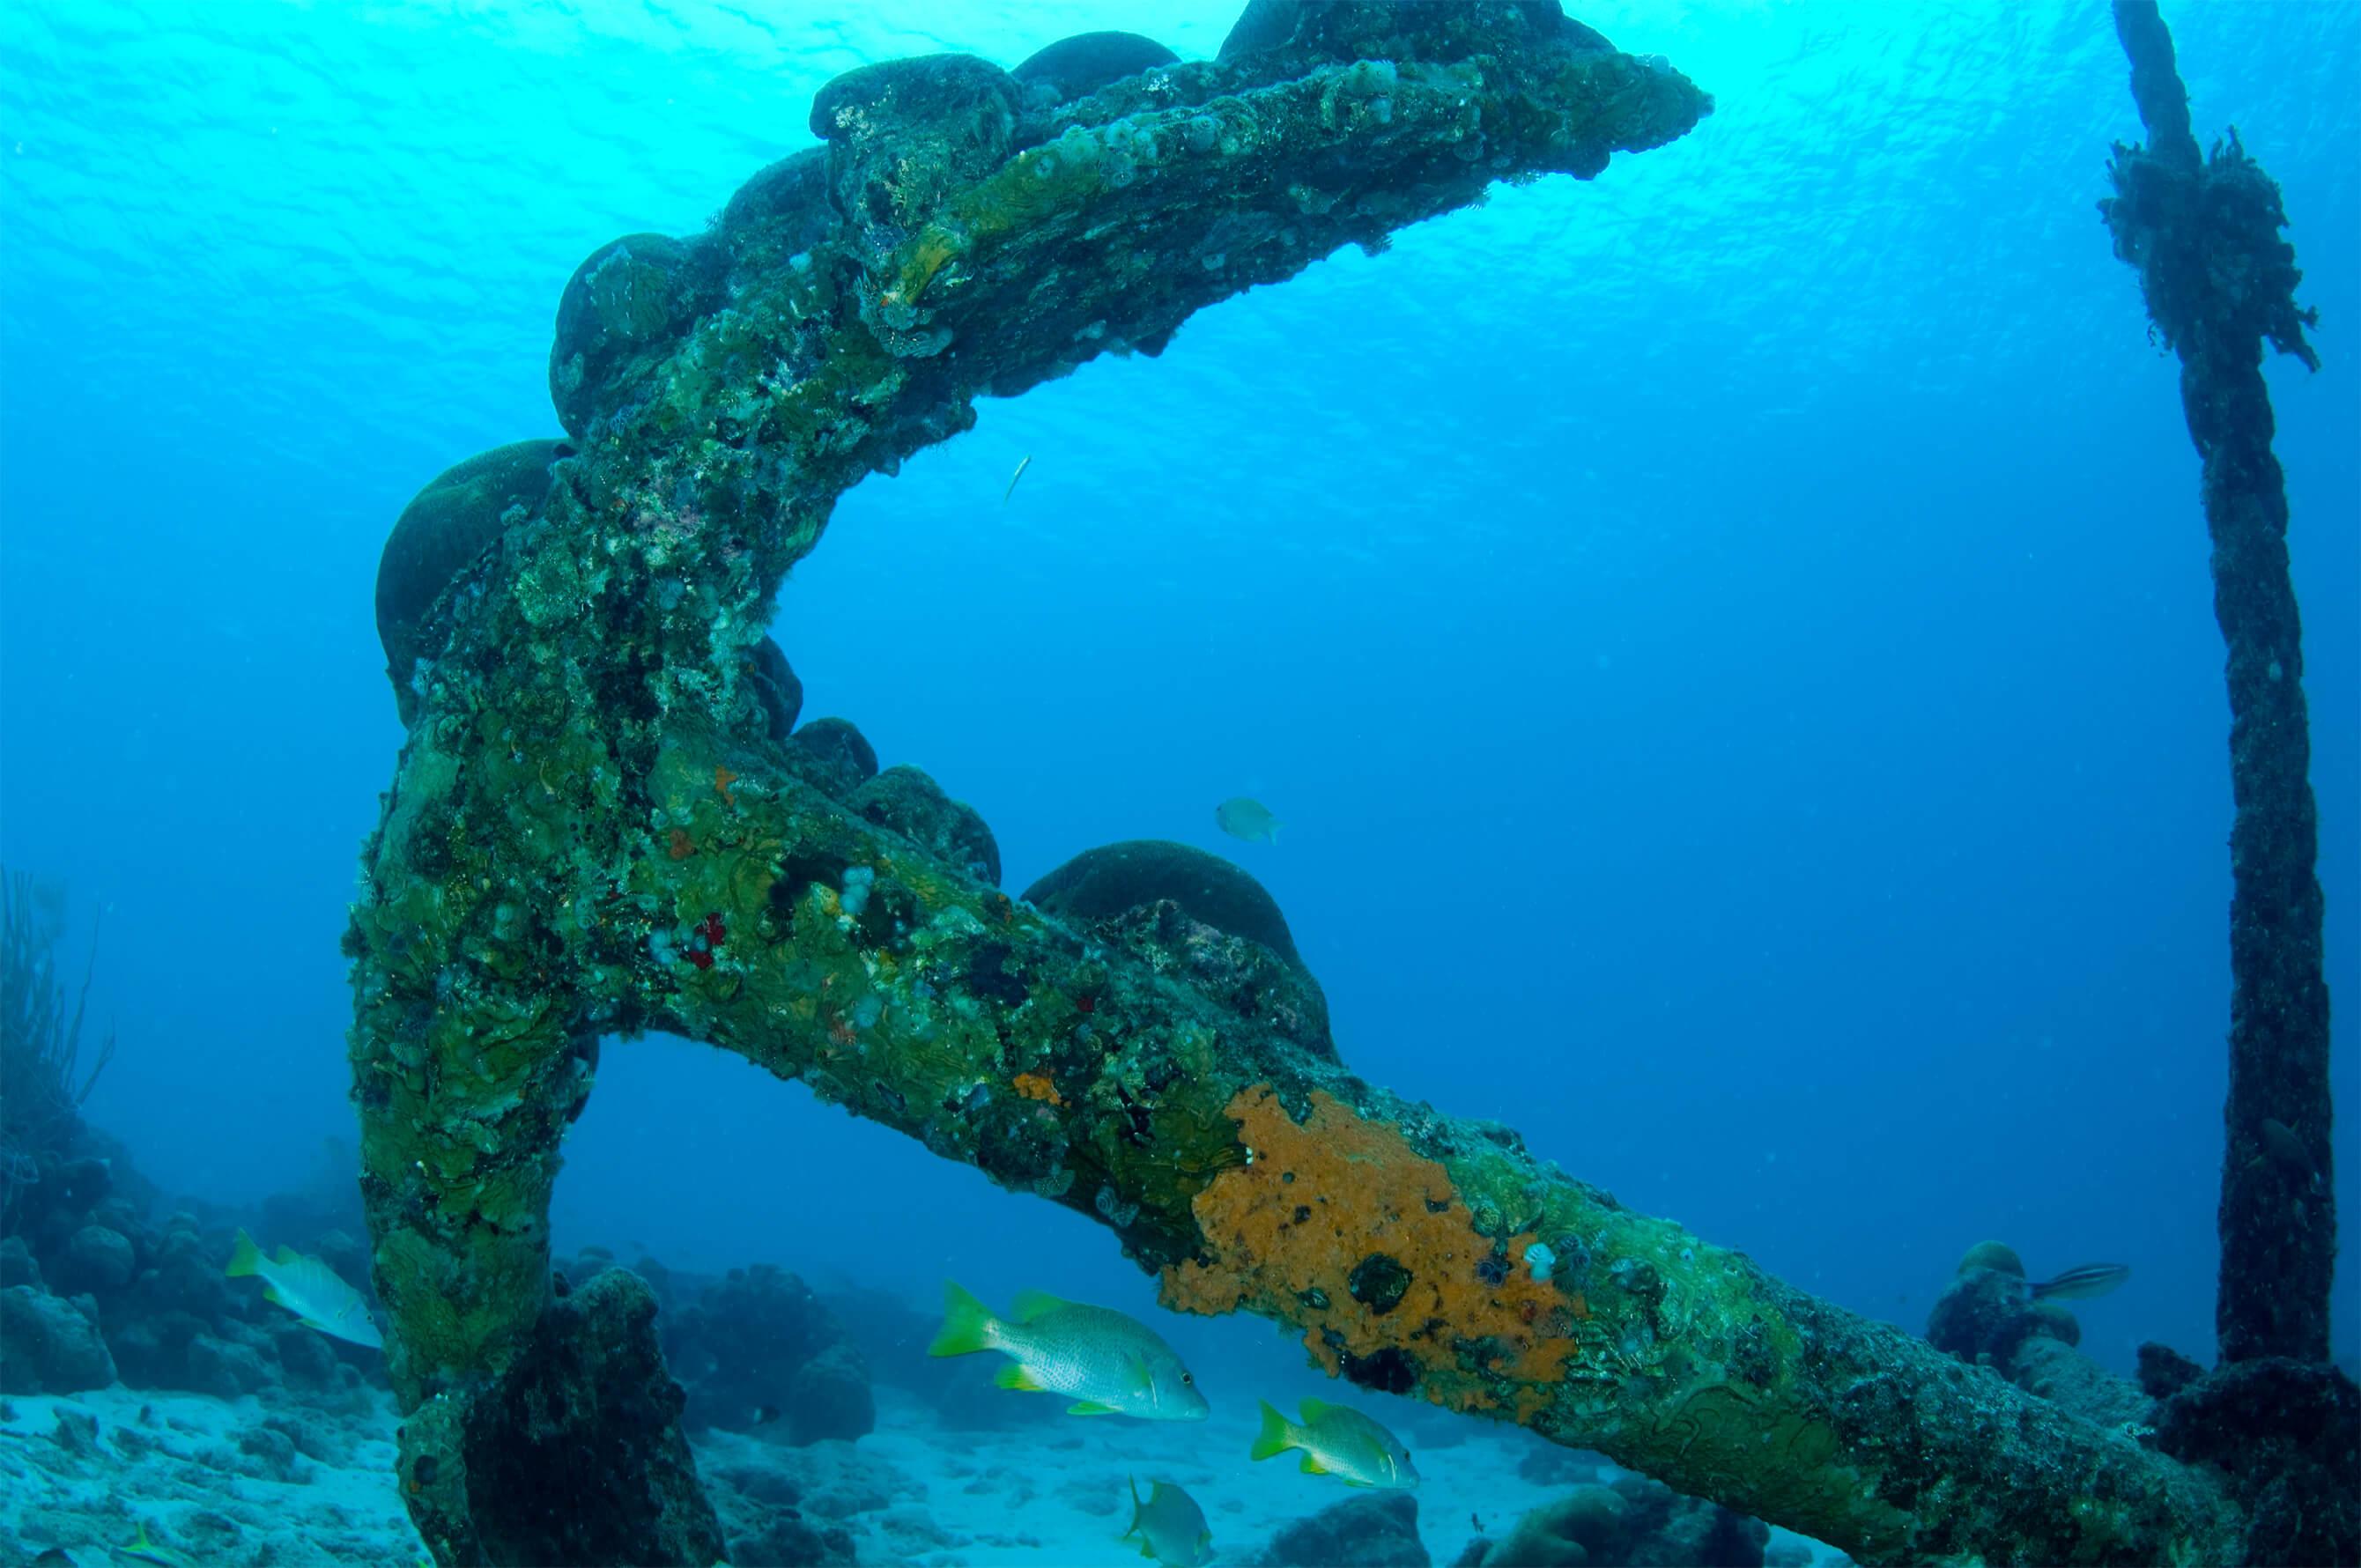 Bonaire_ScubaDiving_Diving_Boat_DiviDive_Diving_Underwater_Coral_Fish_12